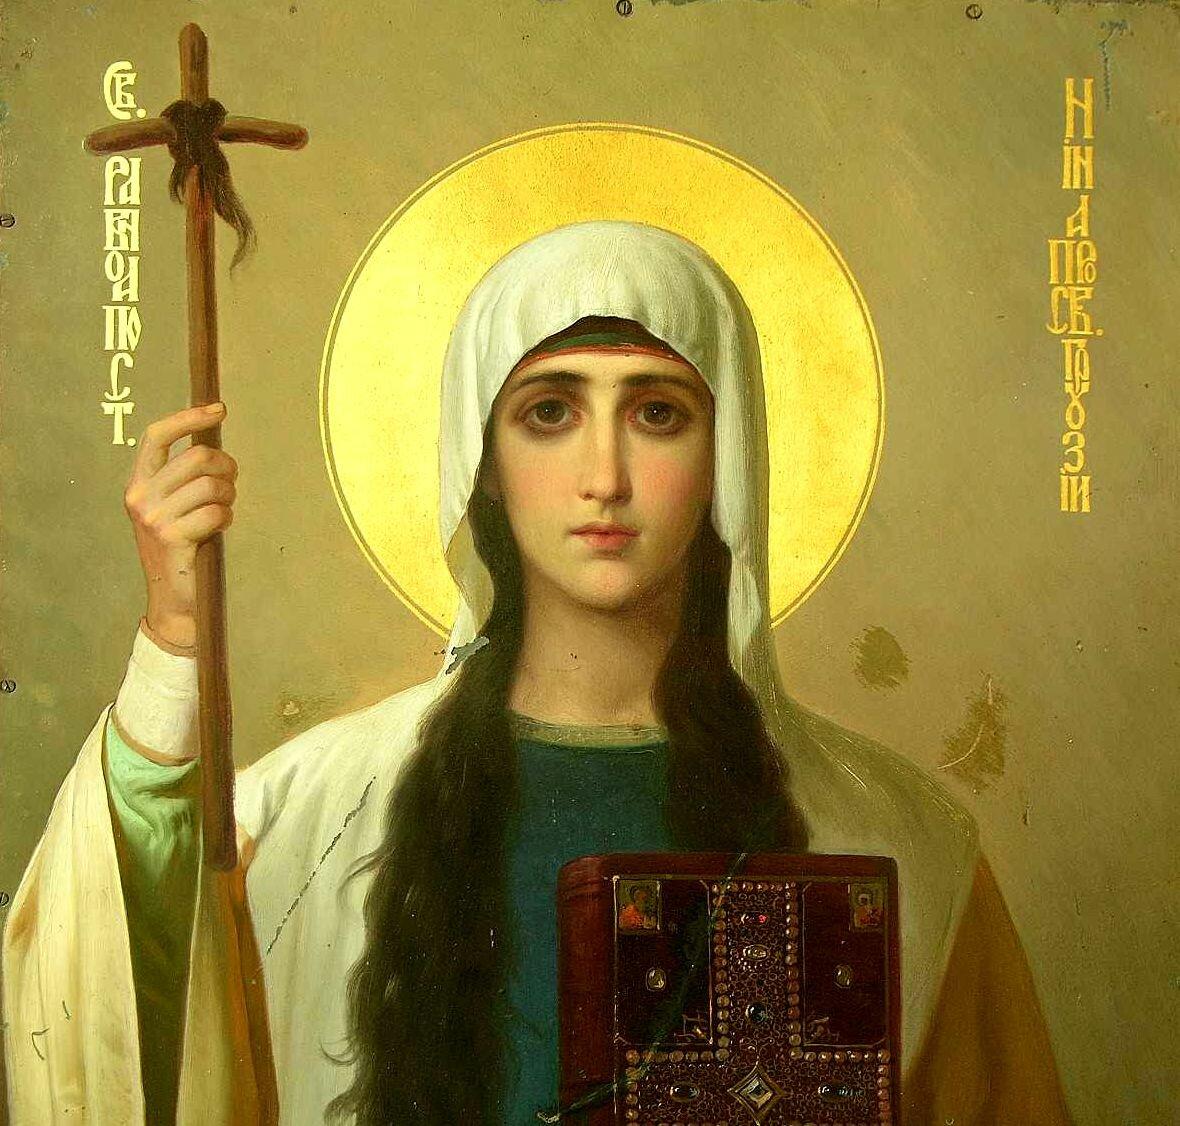 Holy Nina ออกจากการมีส่วนร่วมอย่างมากต่อศาสนาทั่วจอร์เจีย มันเป็นเธอที่พาเธอไปสู่ศาสนาคริสต์